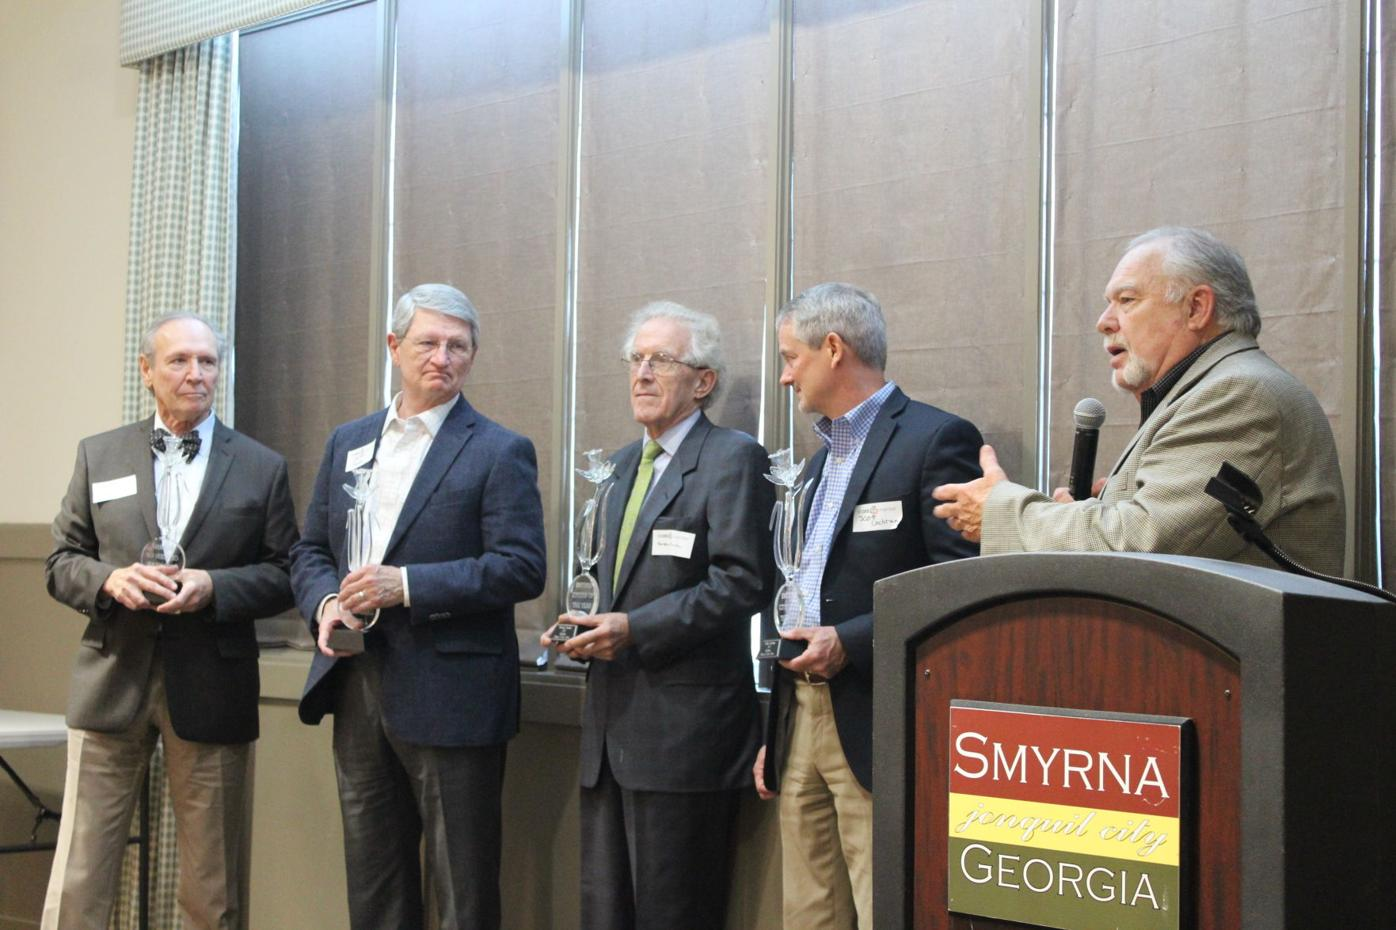 smyrna citizen award (2).JPG